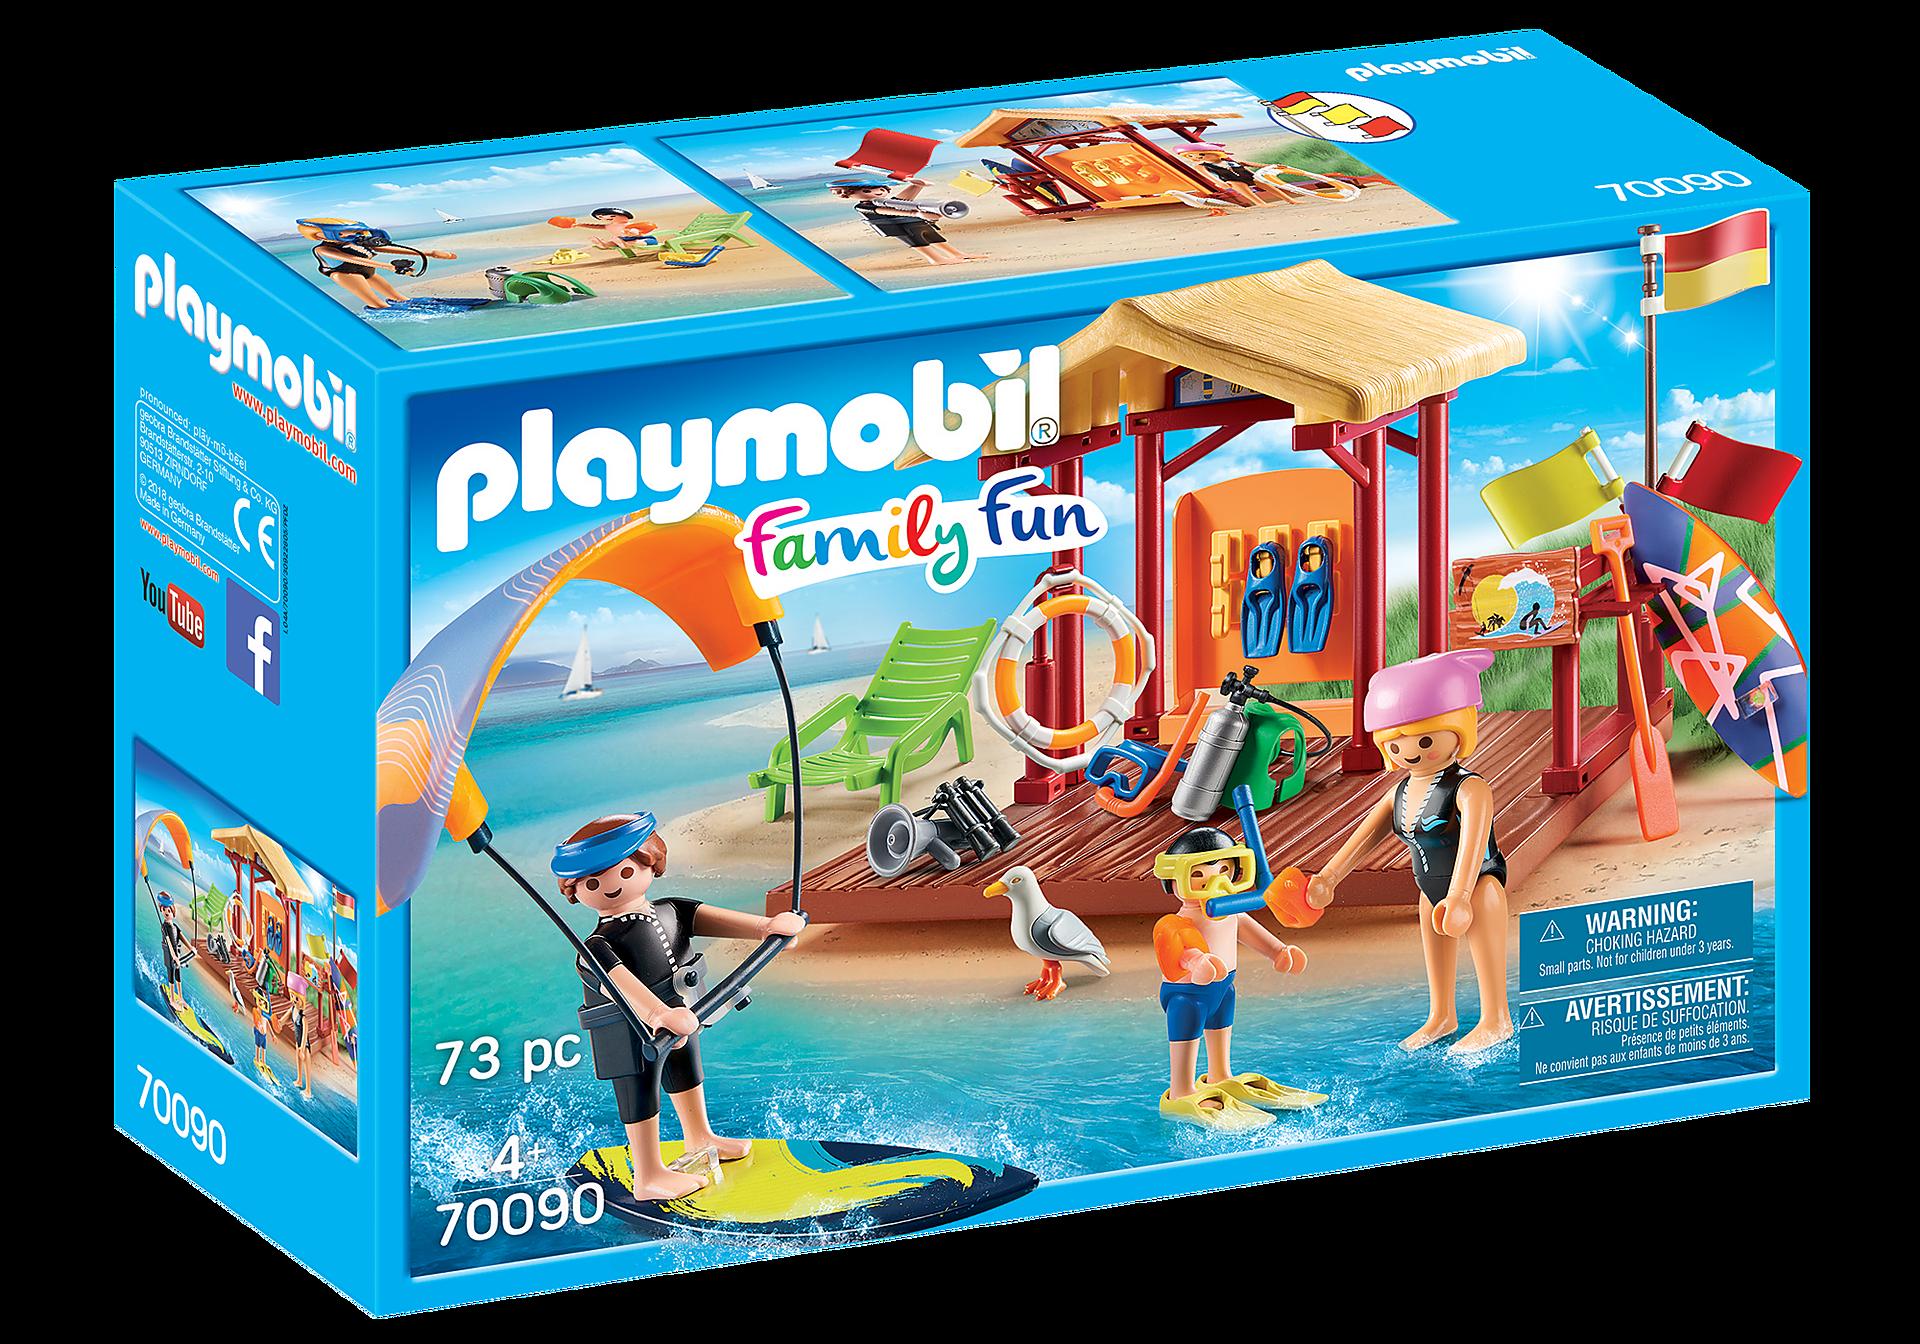 http://media.playmobil.com/i/playmobil/70090_product_box_front/Centro sport acquatici